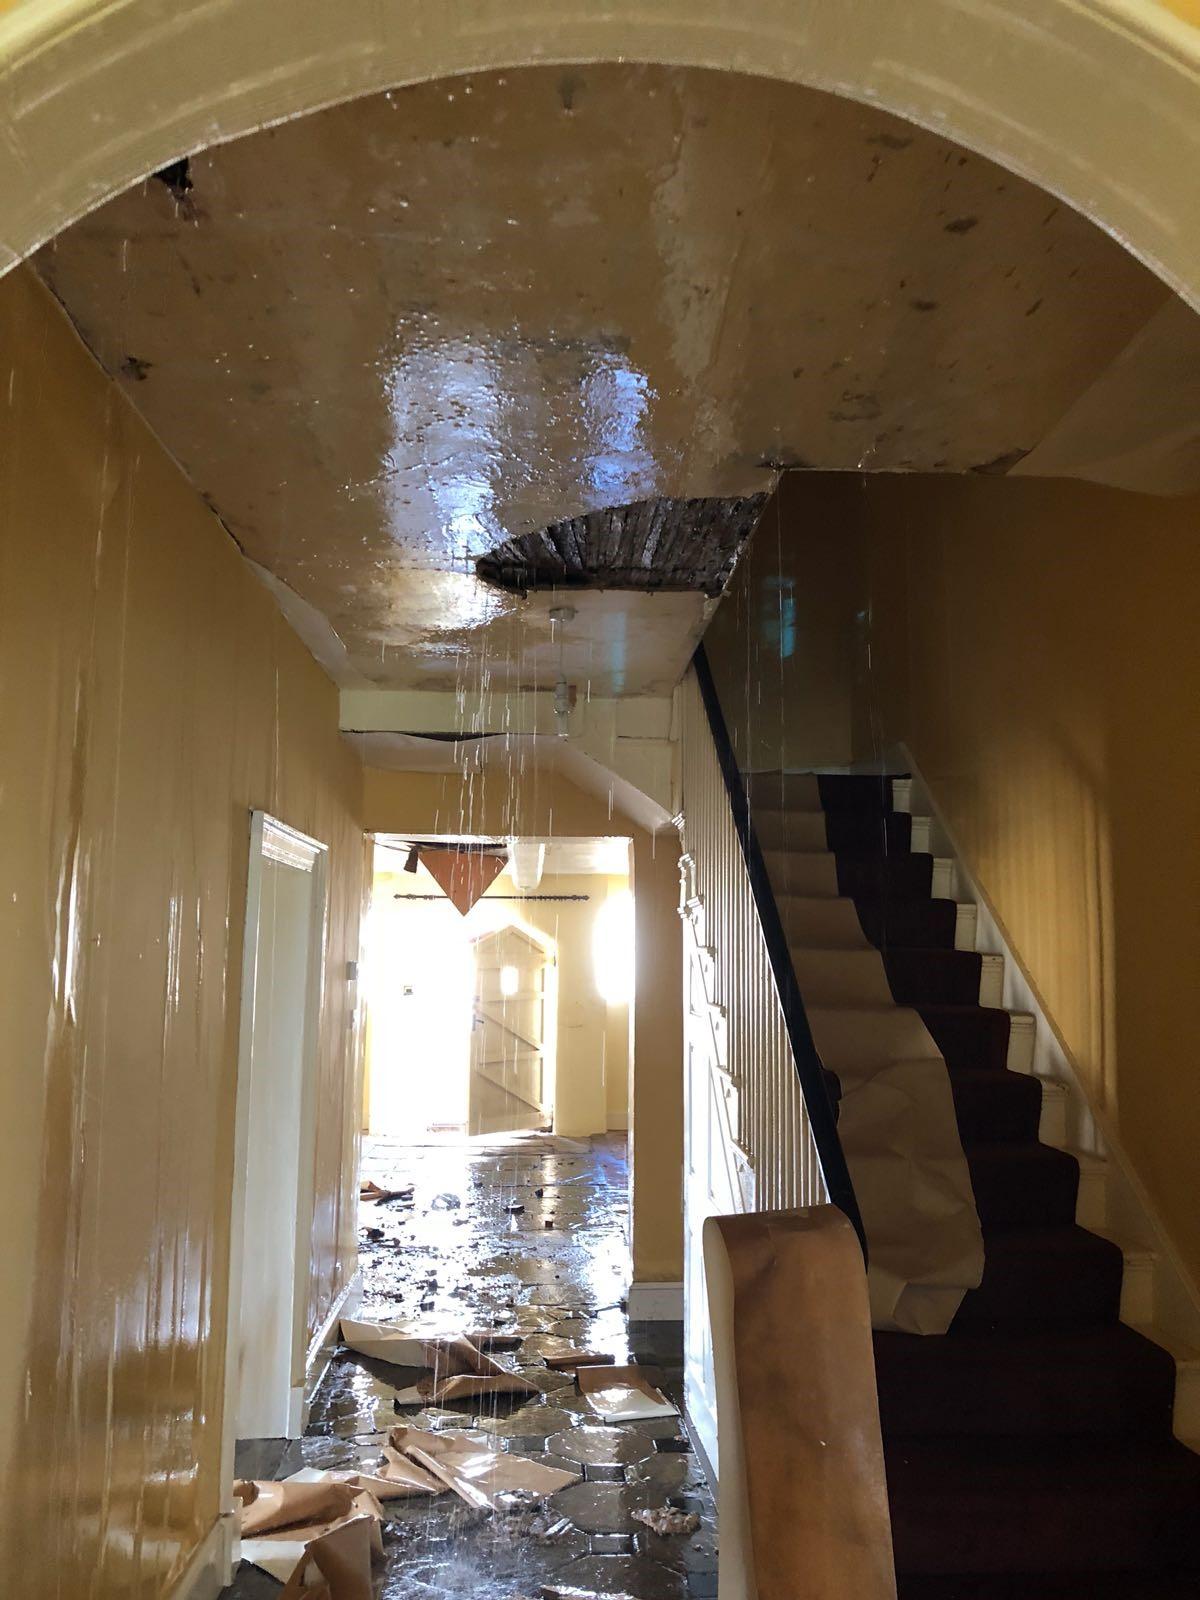 Flooded property – burst pipes